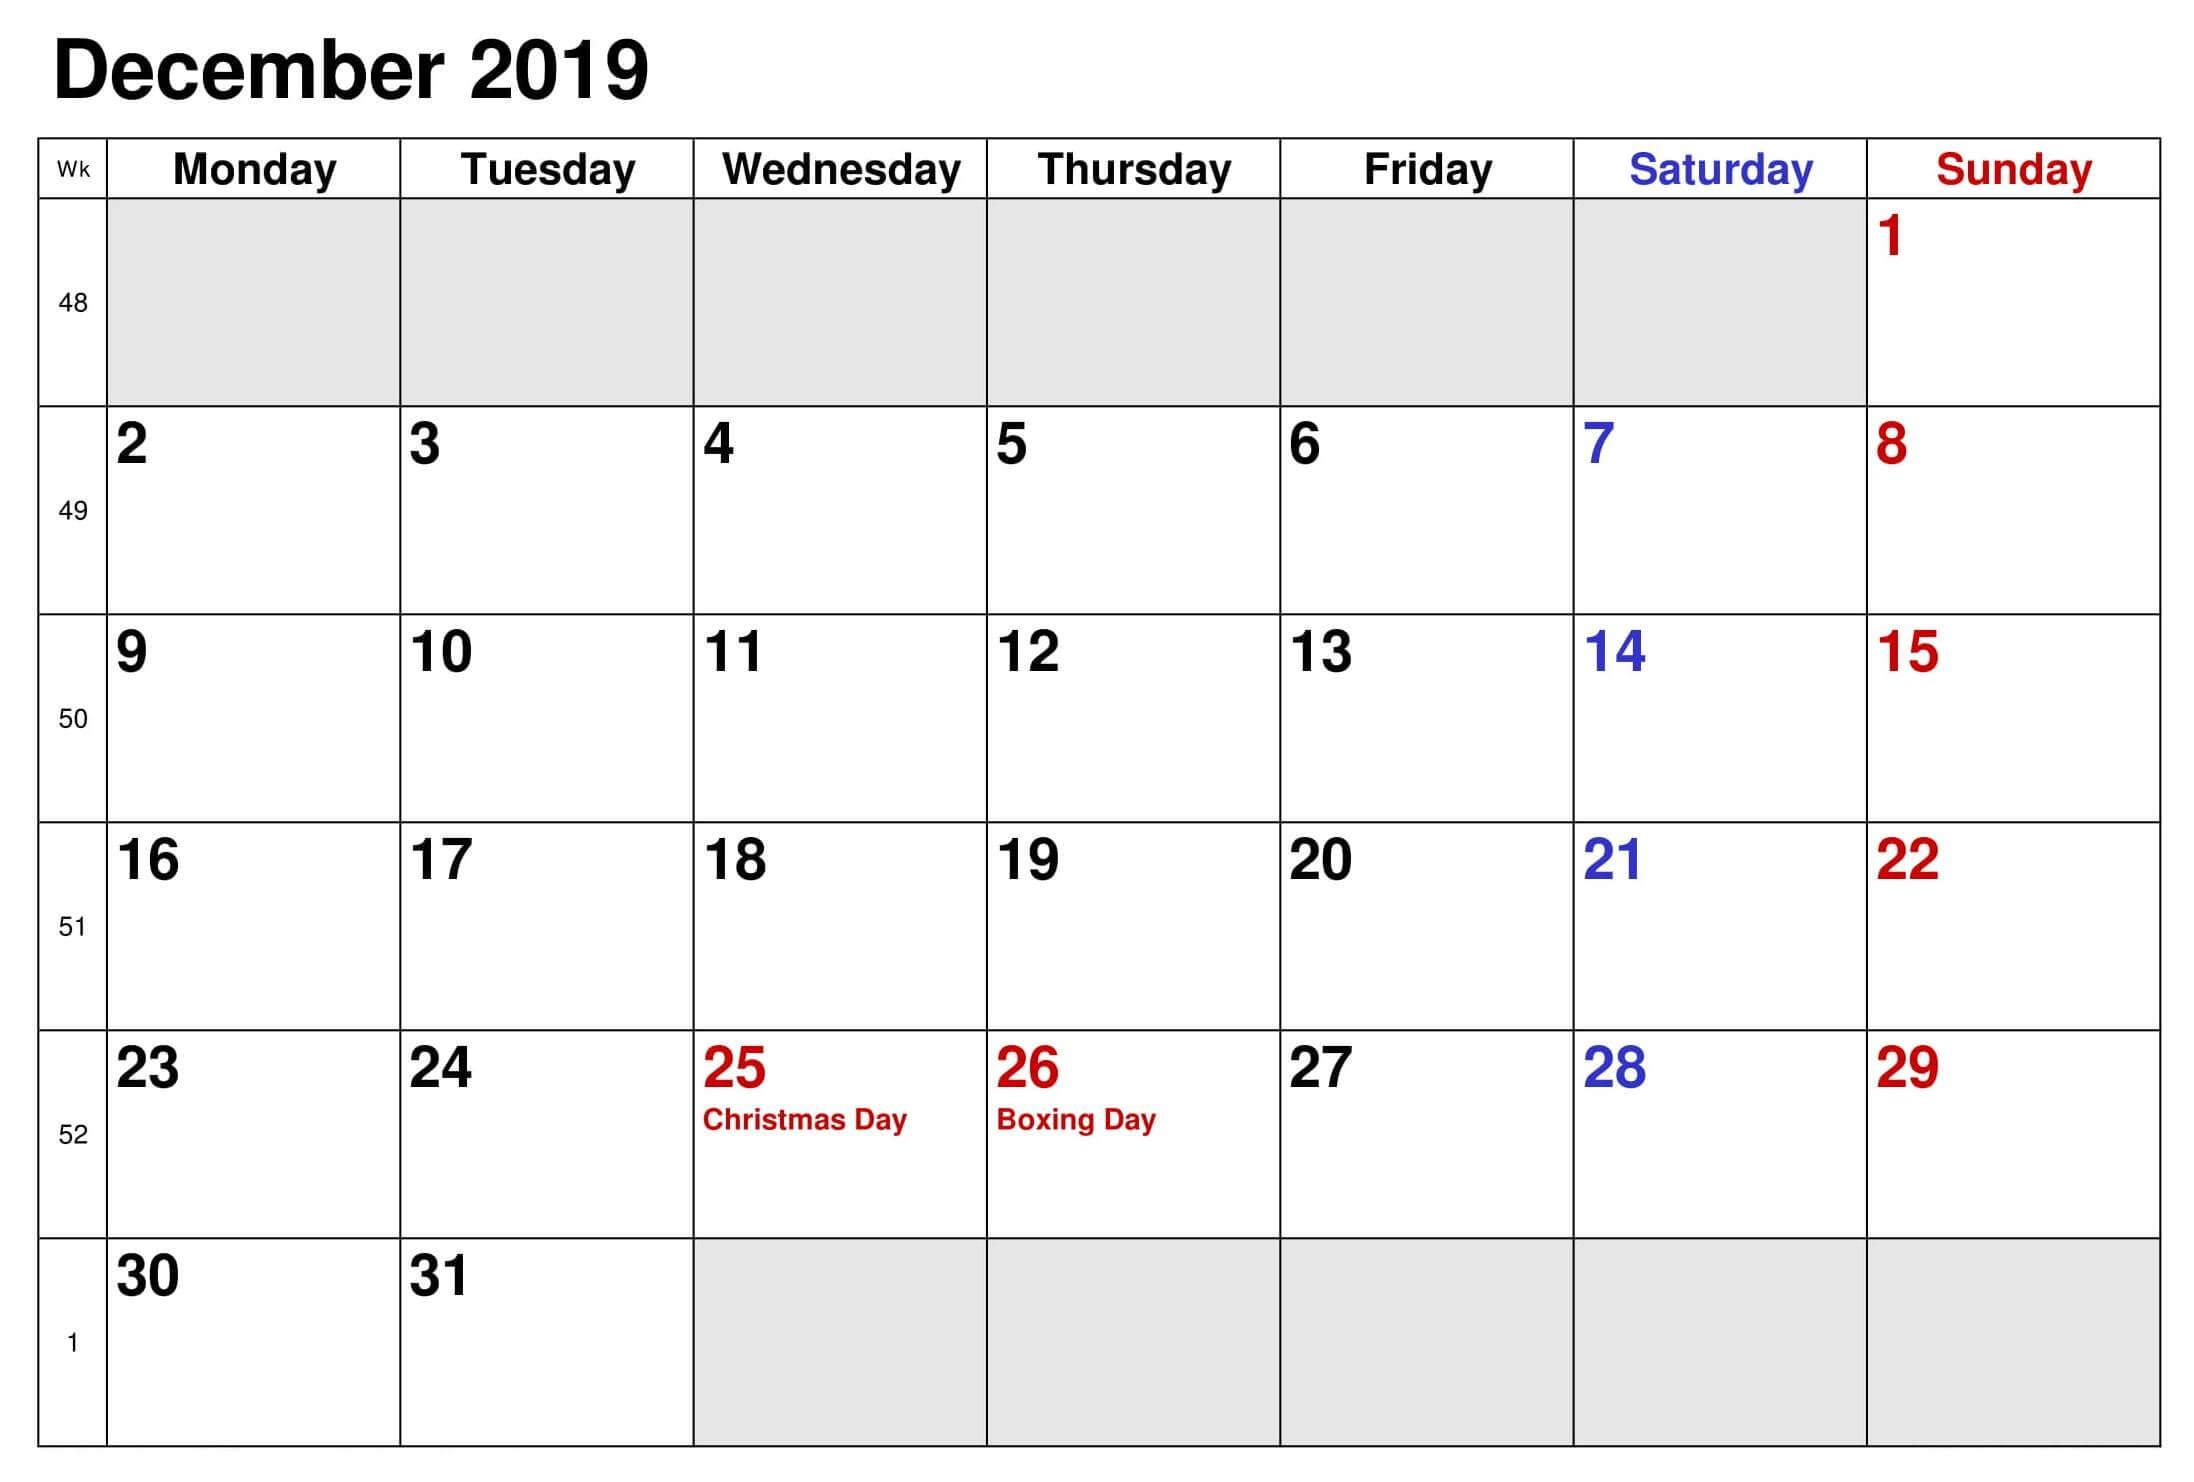 December 2019 UK Bank Holidays Calendar